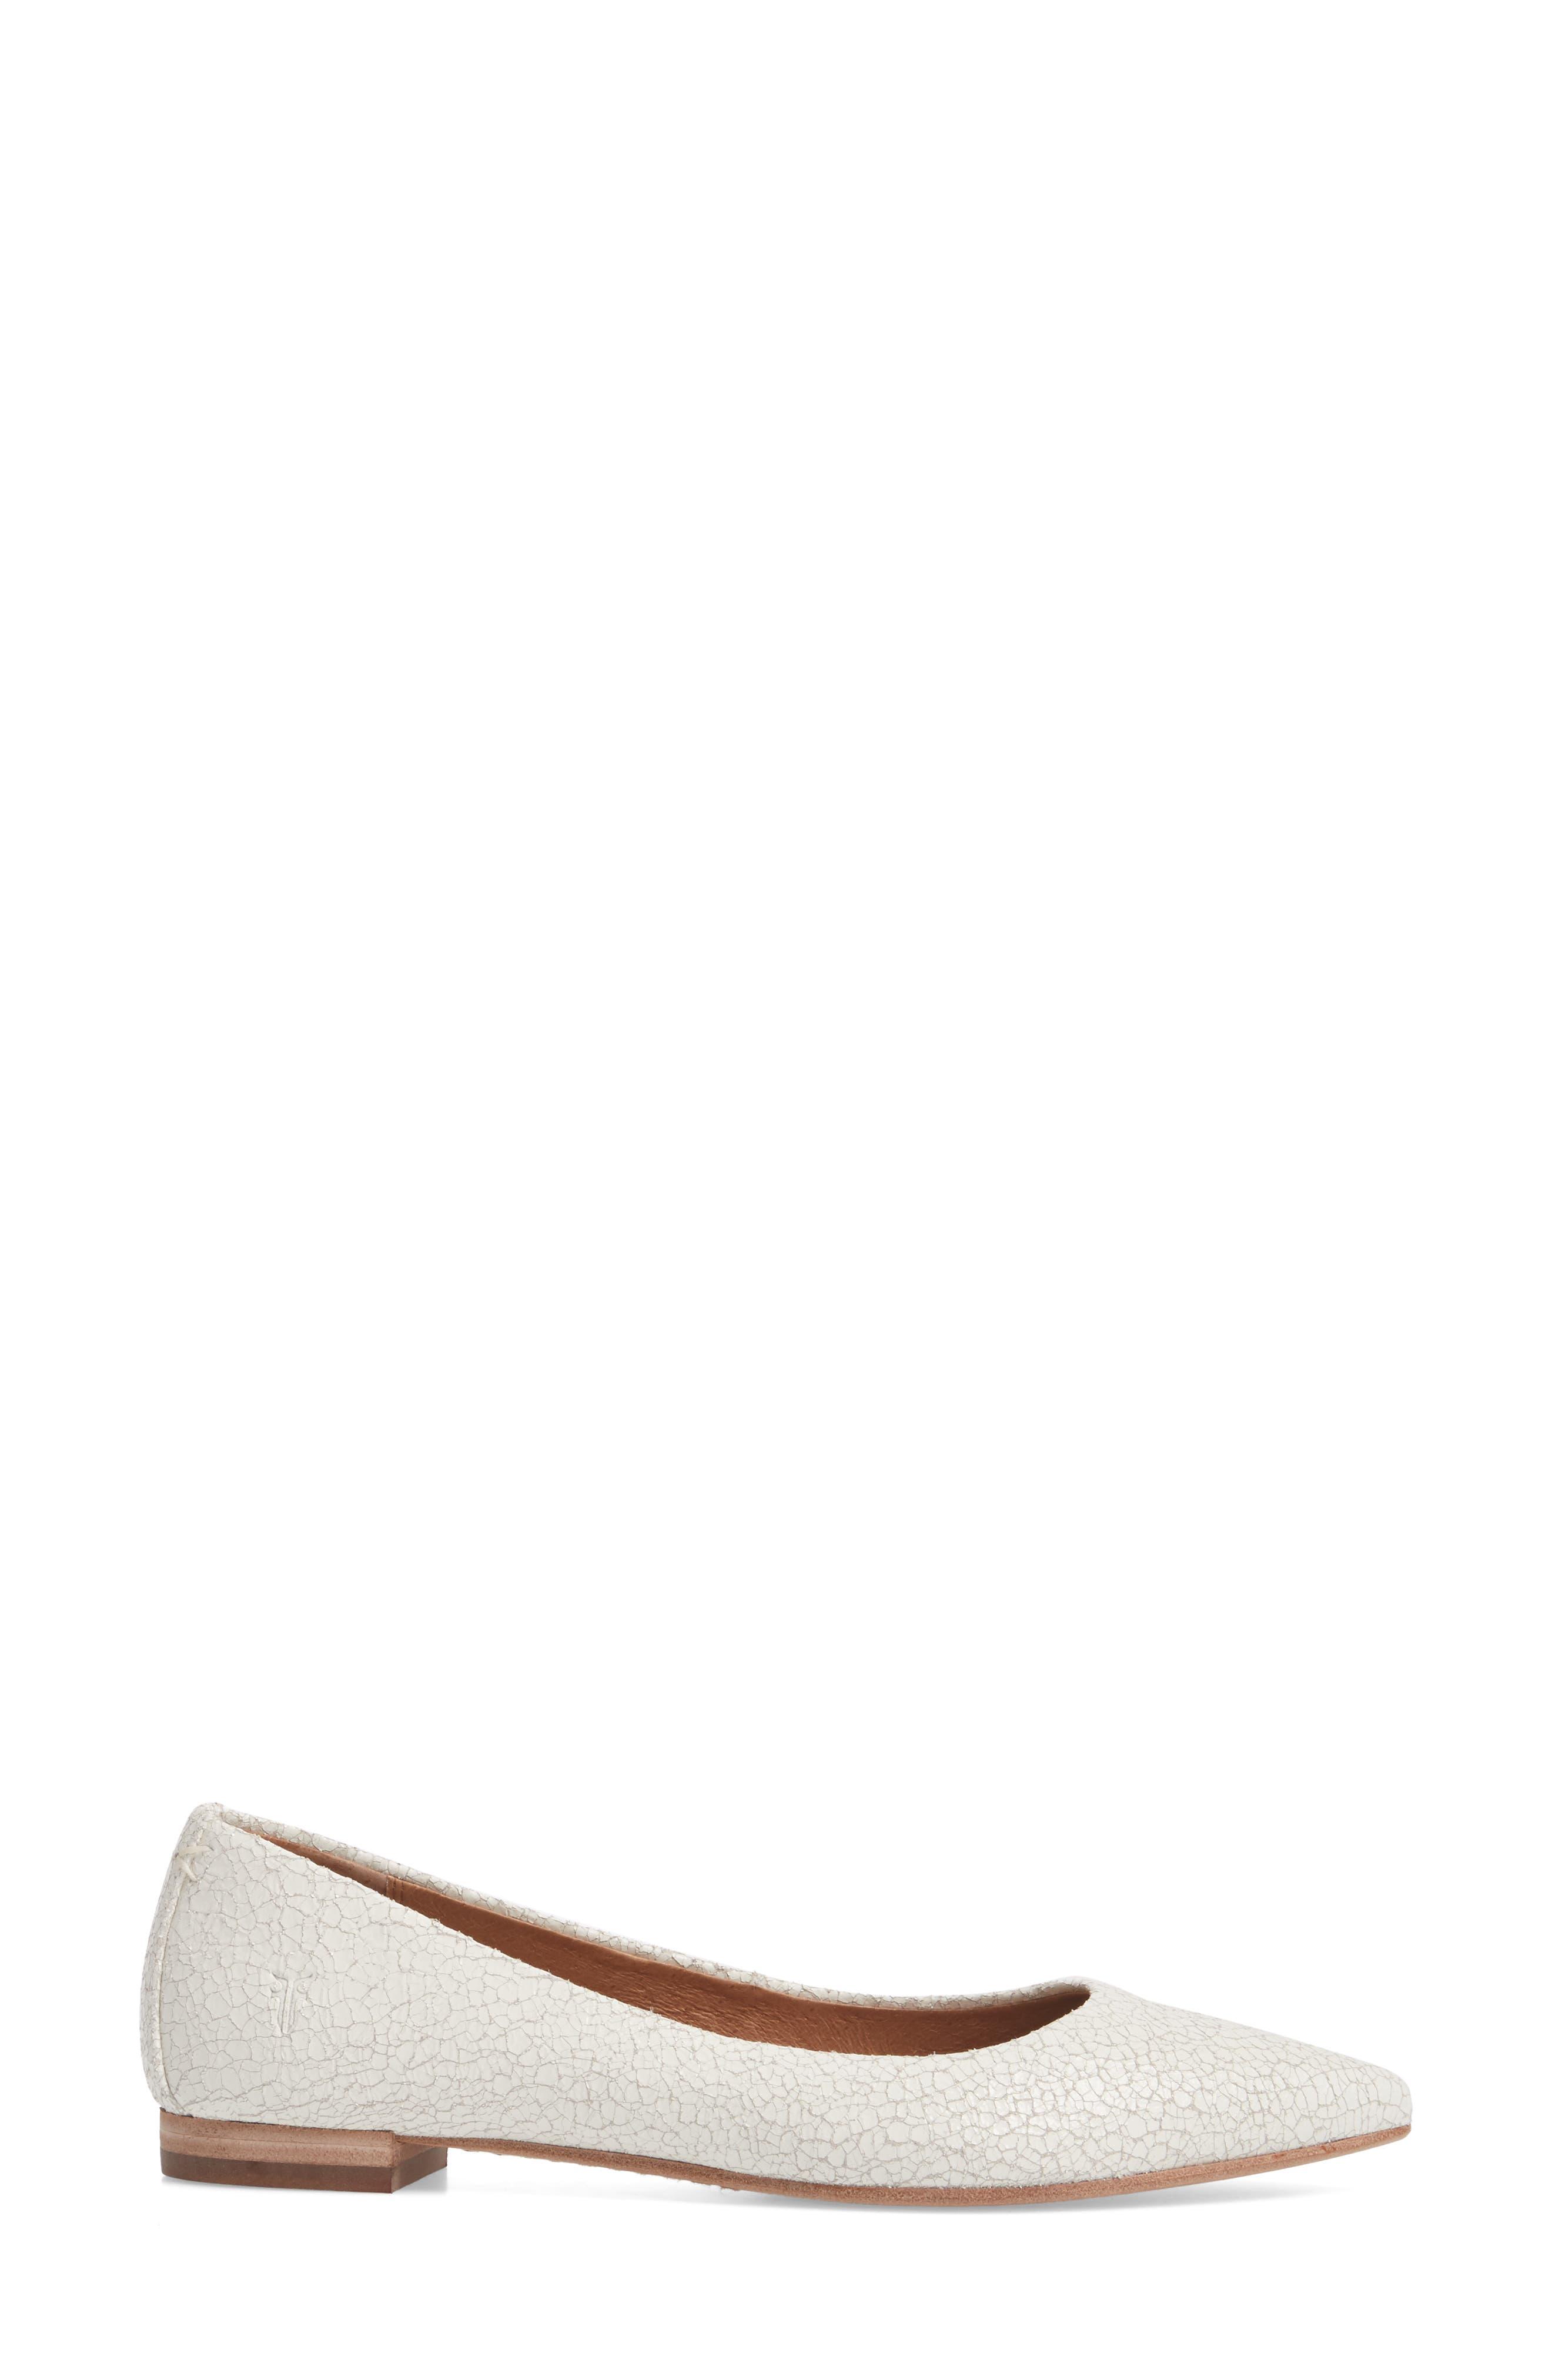 Sienna Pointy Toe Ballet Flat,                             Alternate thumbnail 8, color,